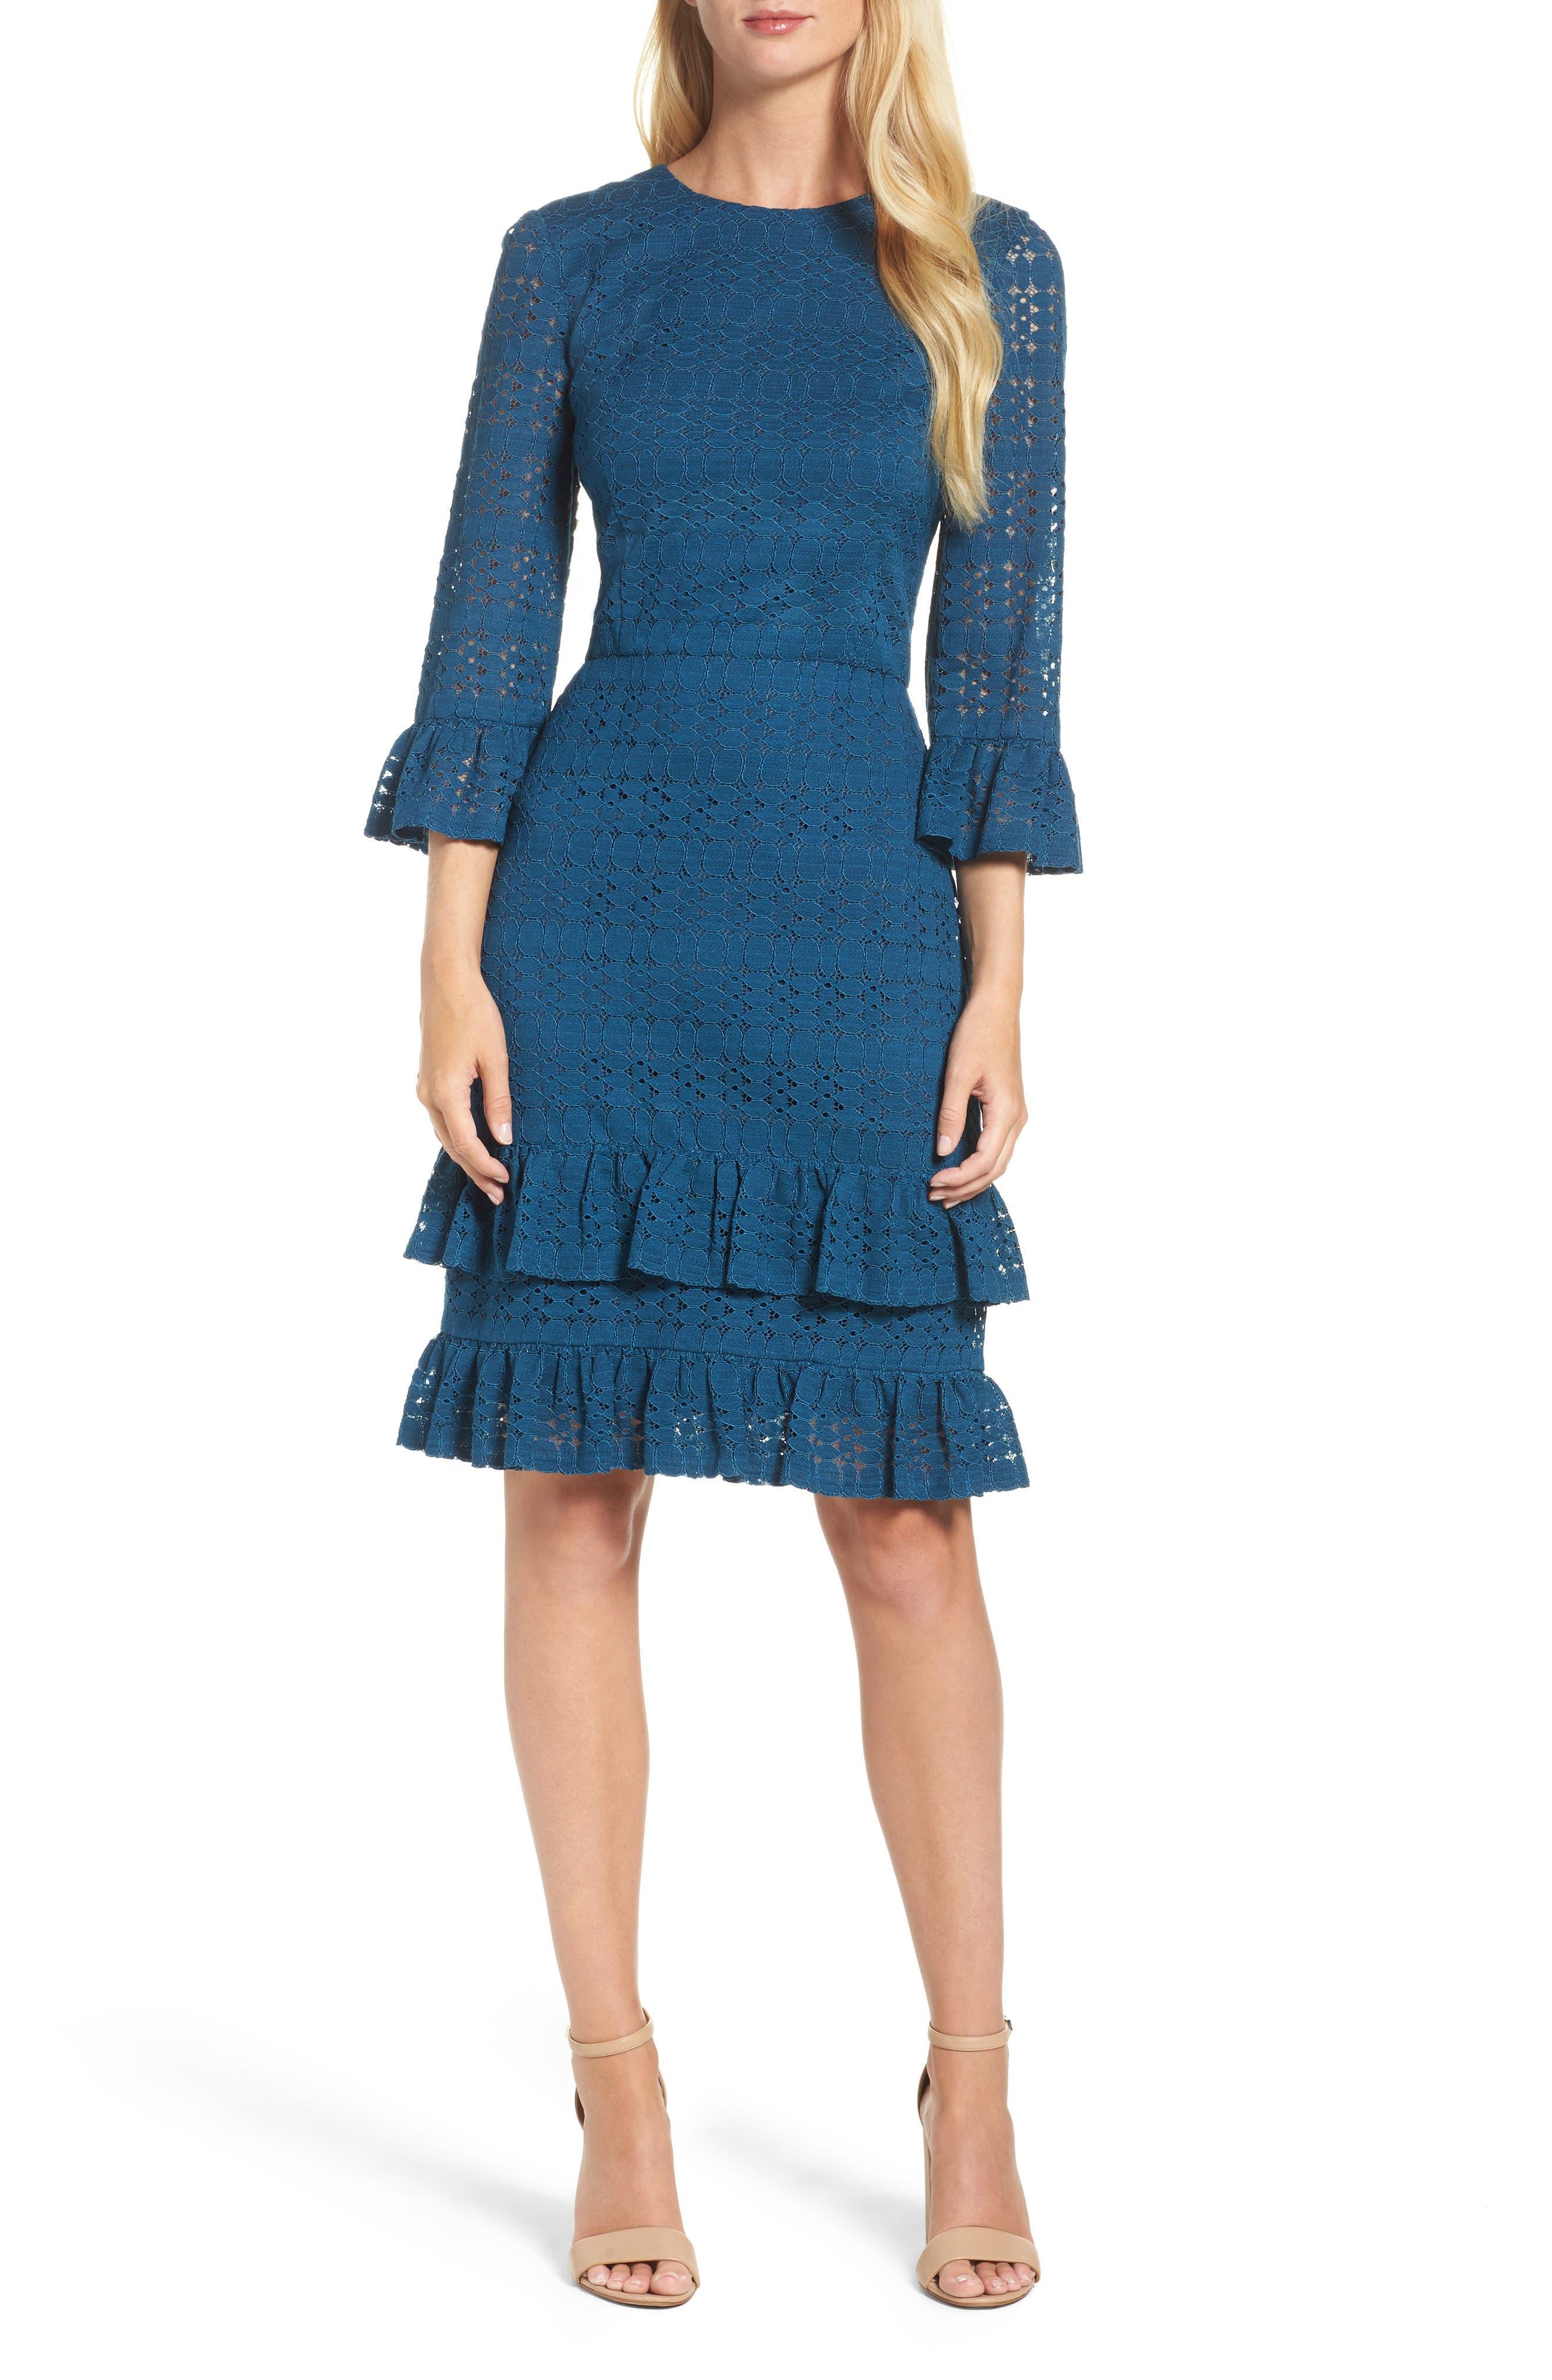 Alternate Image 1 Selected - Maggy London Ruffle Lace Sheath Dress (Regular & Petite)